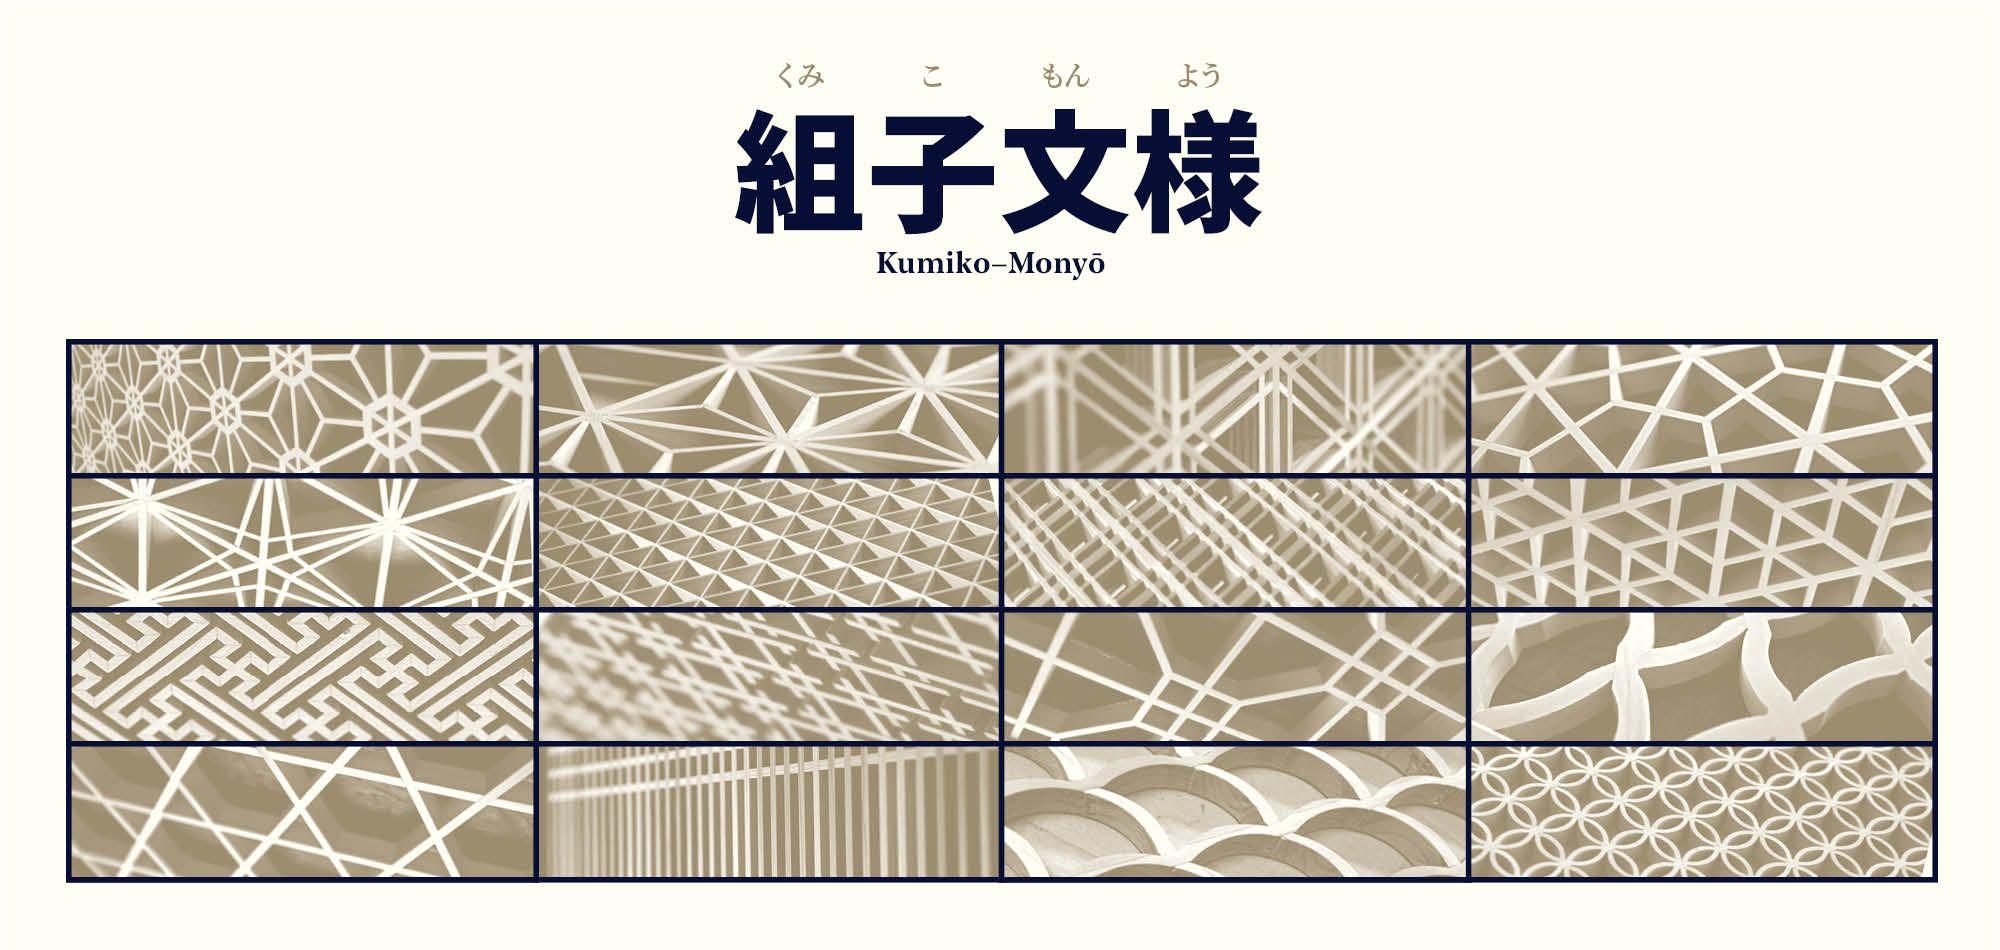 Redaktionelle Gestaltung 02: 組子文様 KUMIKO-MONYŌ (Japanese Traditional Woodworking Patterns)